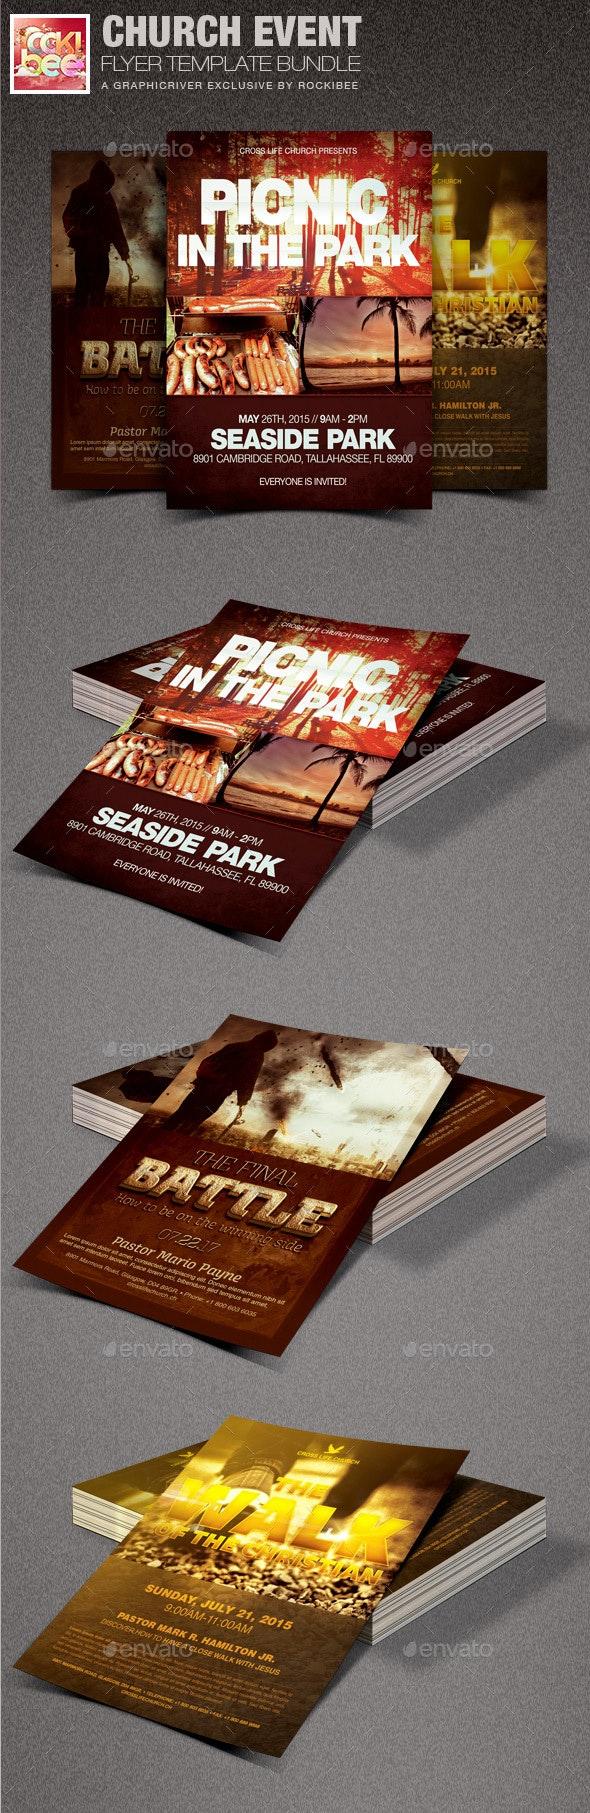 Church Event Flyer Template Bundle - Church Flyers